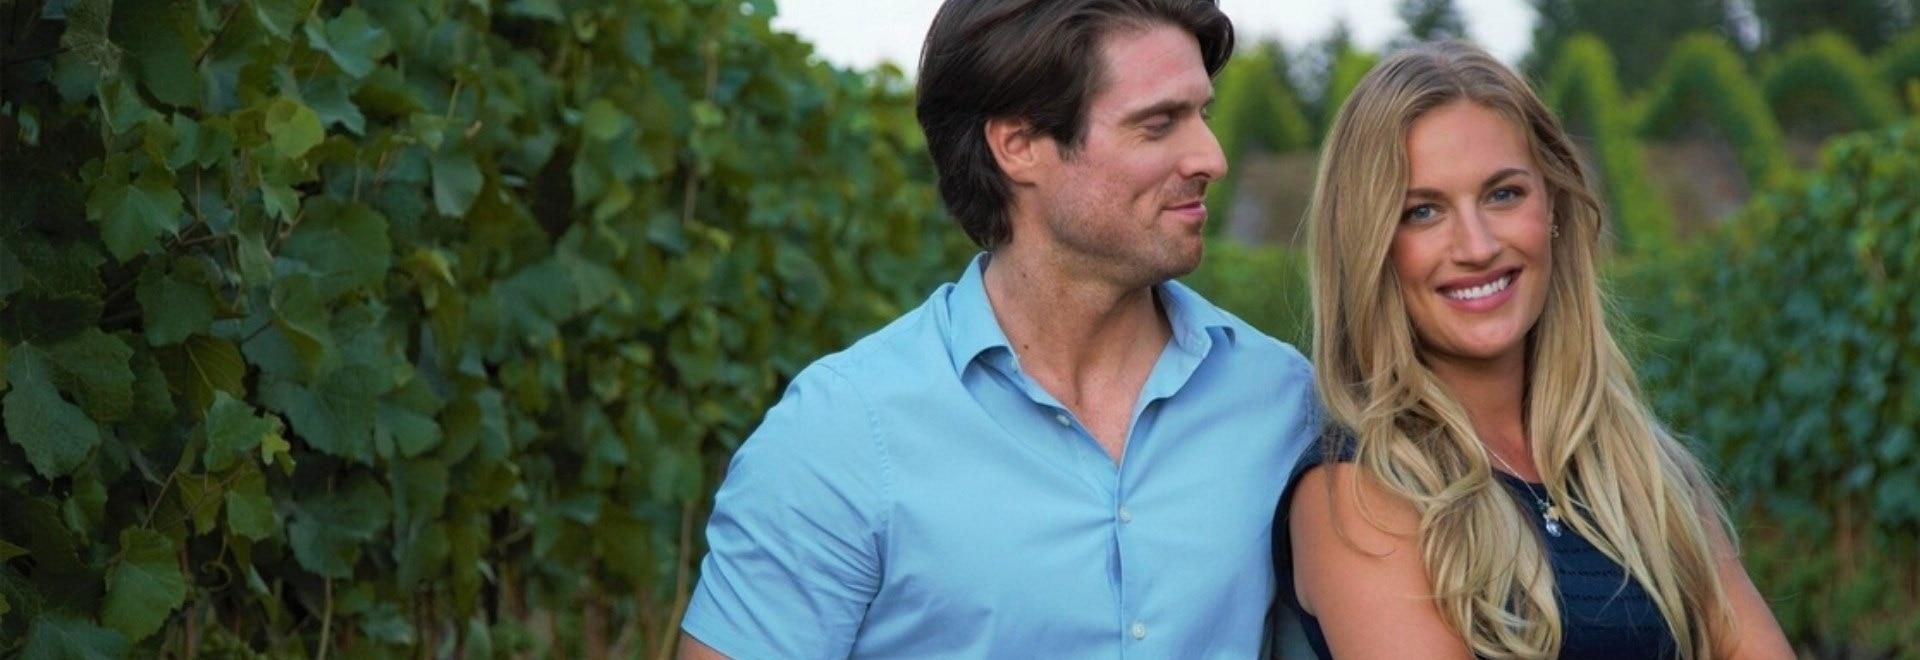 Amore tra le vigne